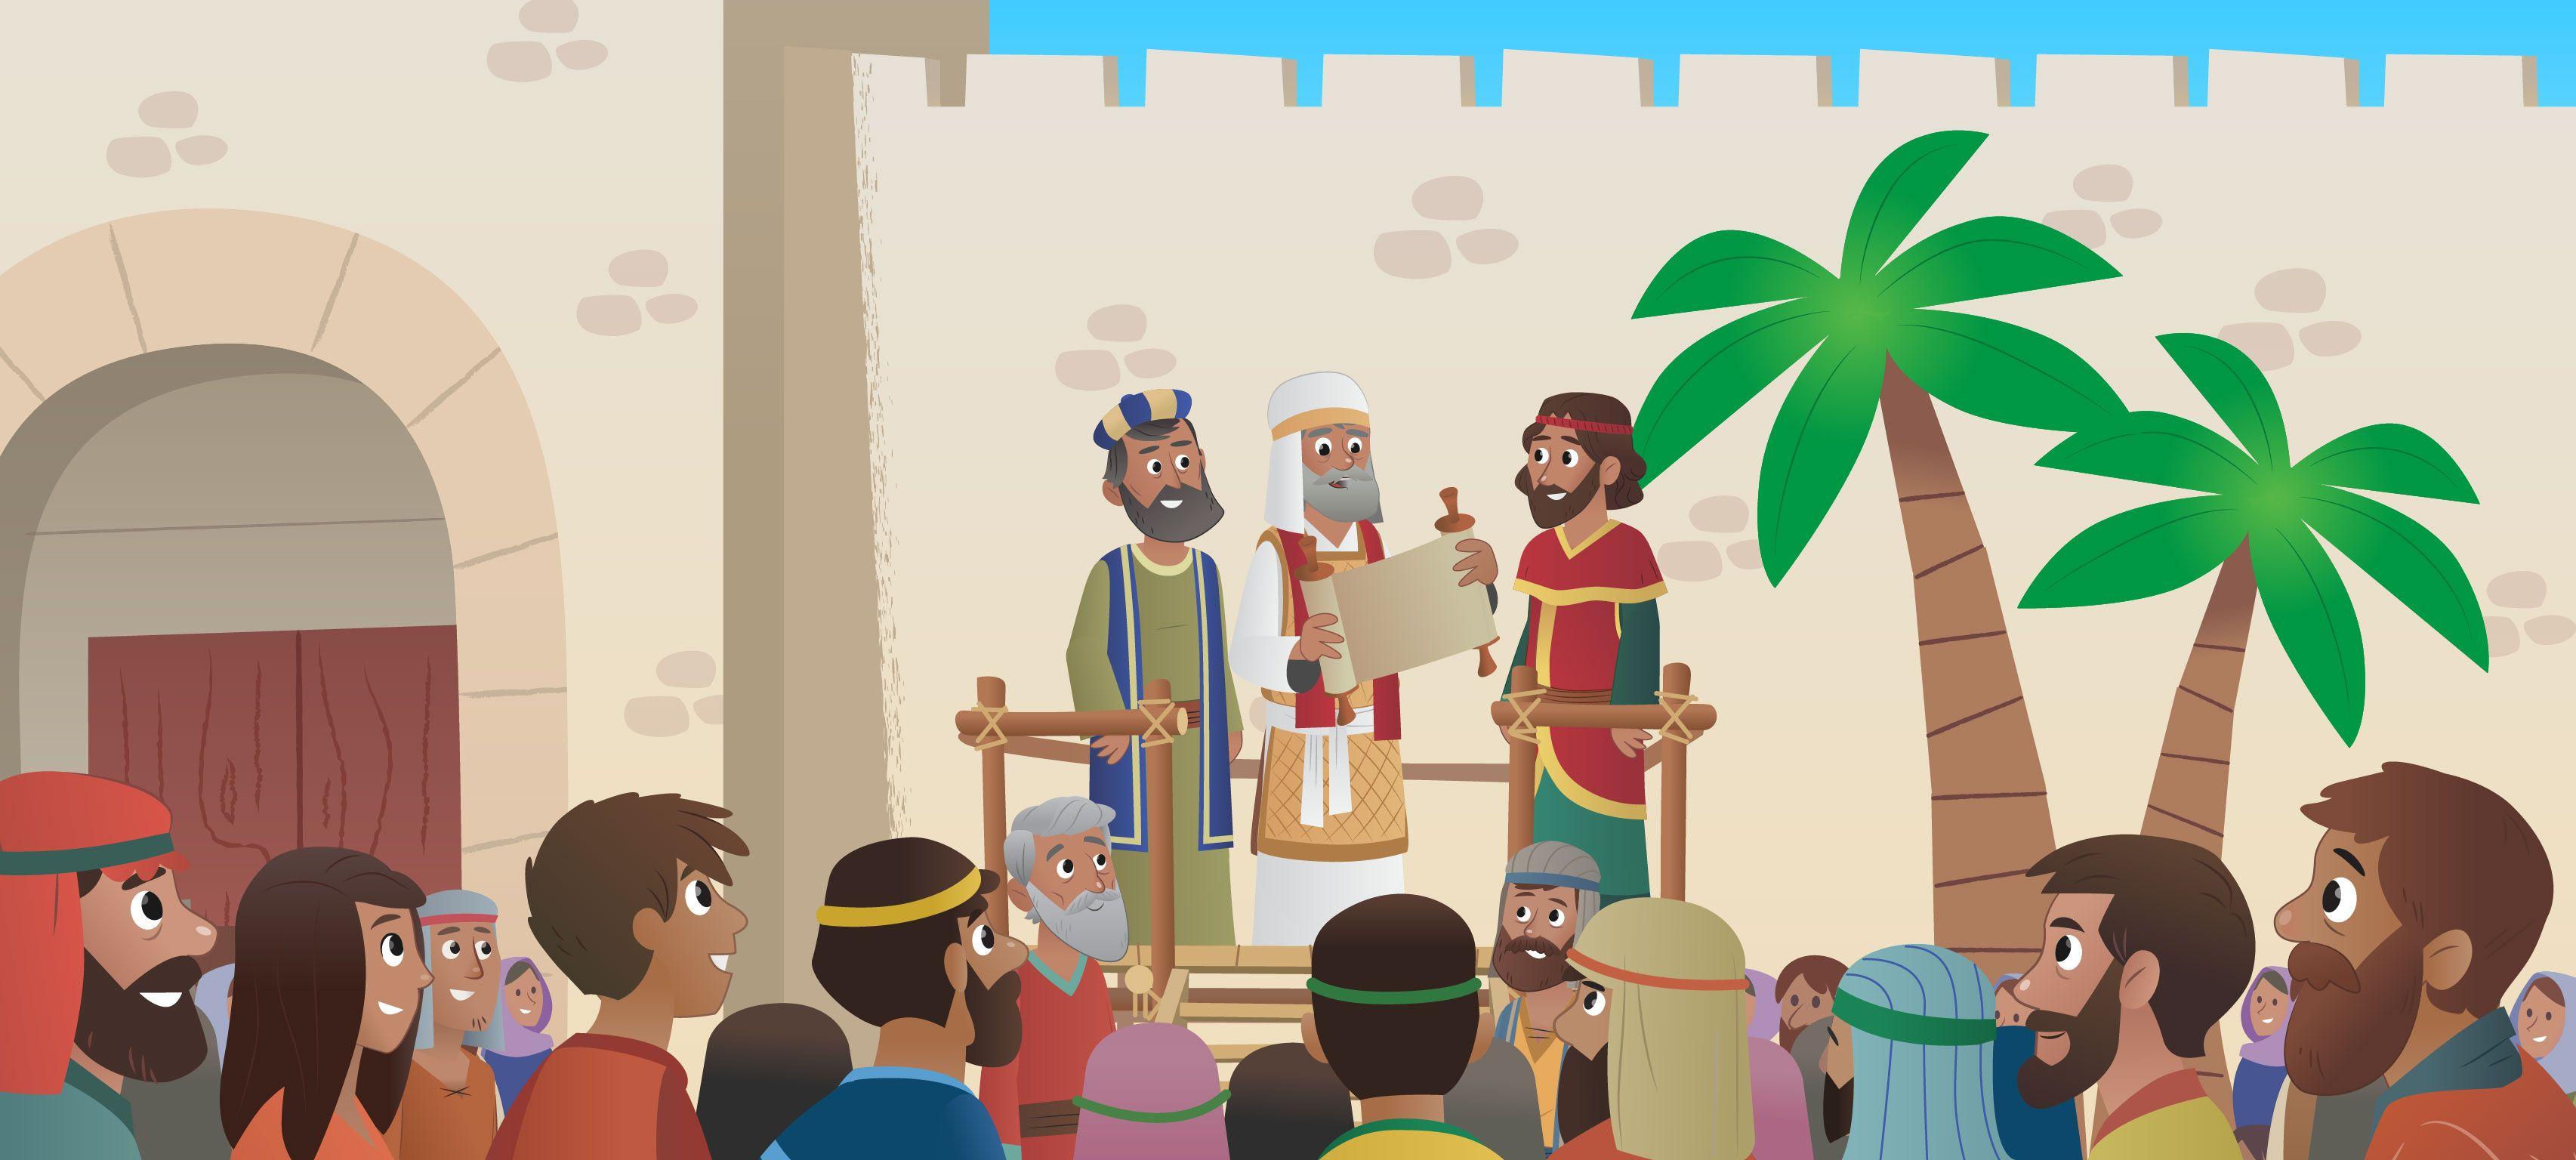 TheWallsGoUp_Scene6_FINAL Estudios bíblicos para niños